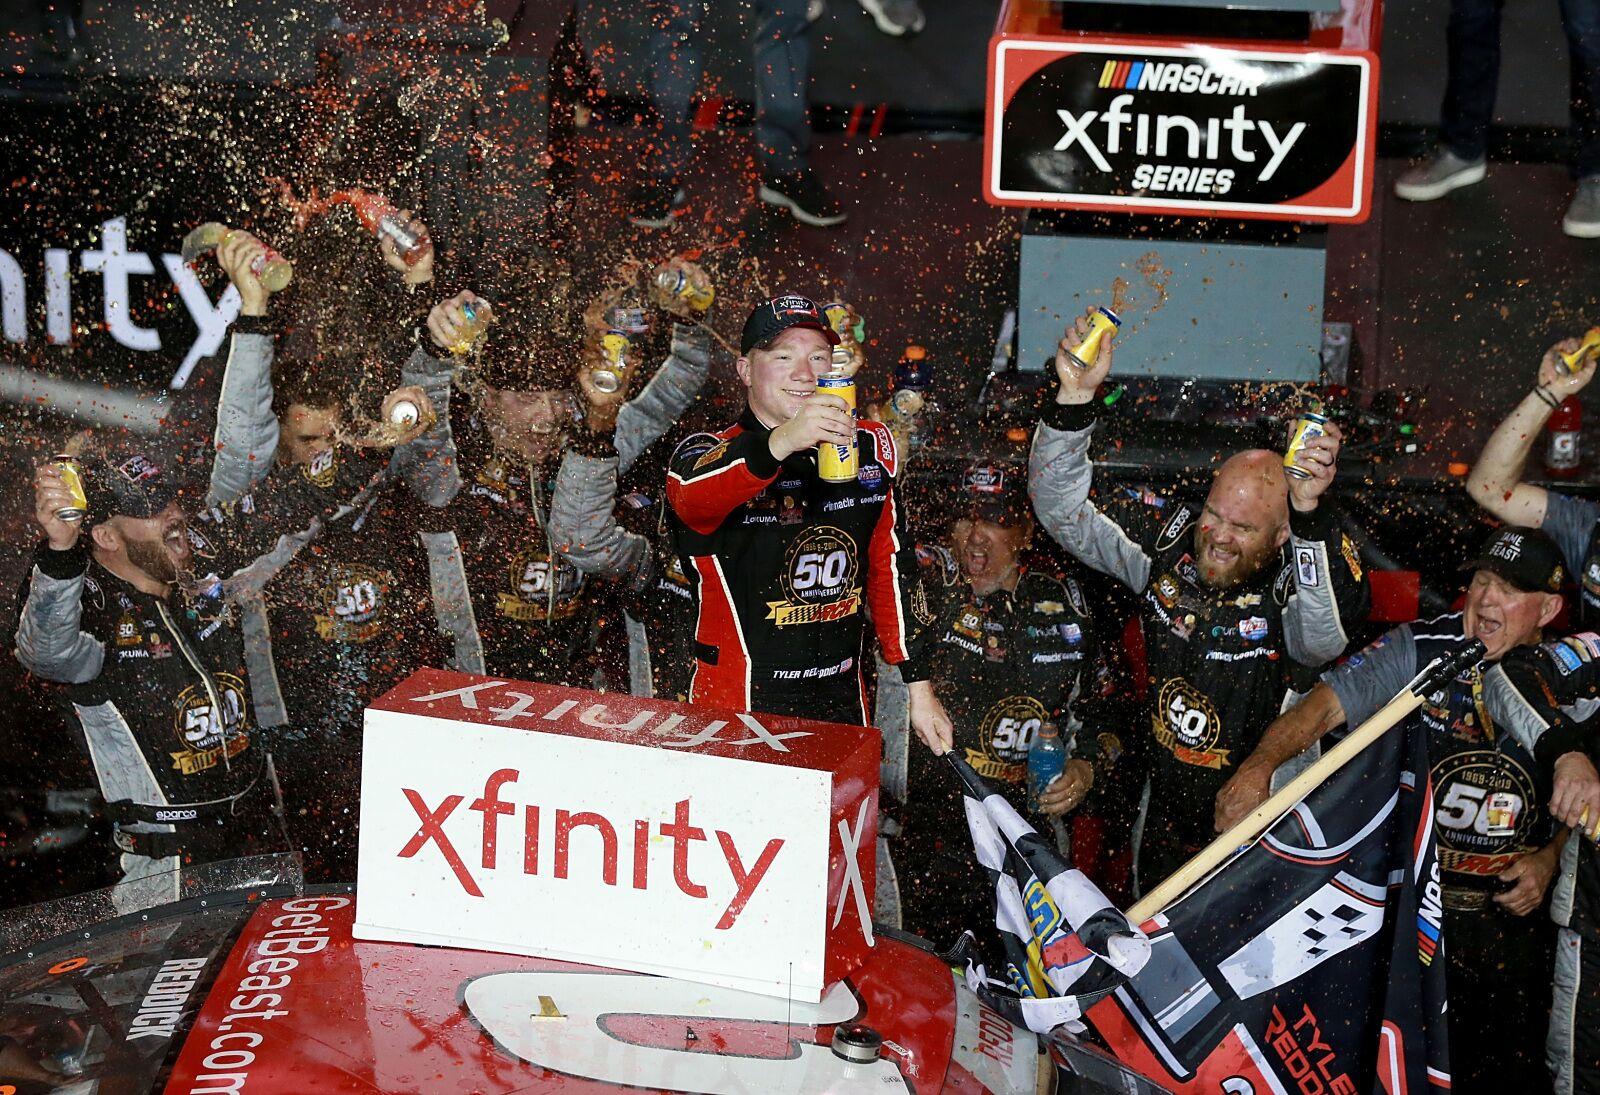 NASCAR Xfinity Series: Tyler Reddick wins 2019 Ford EcoBoost 300